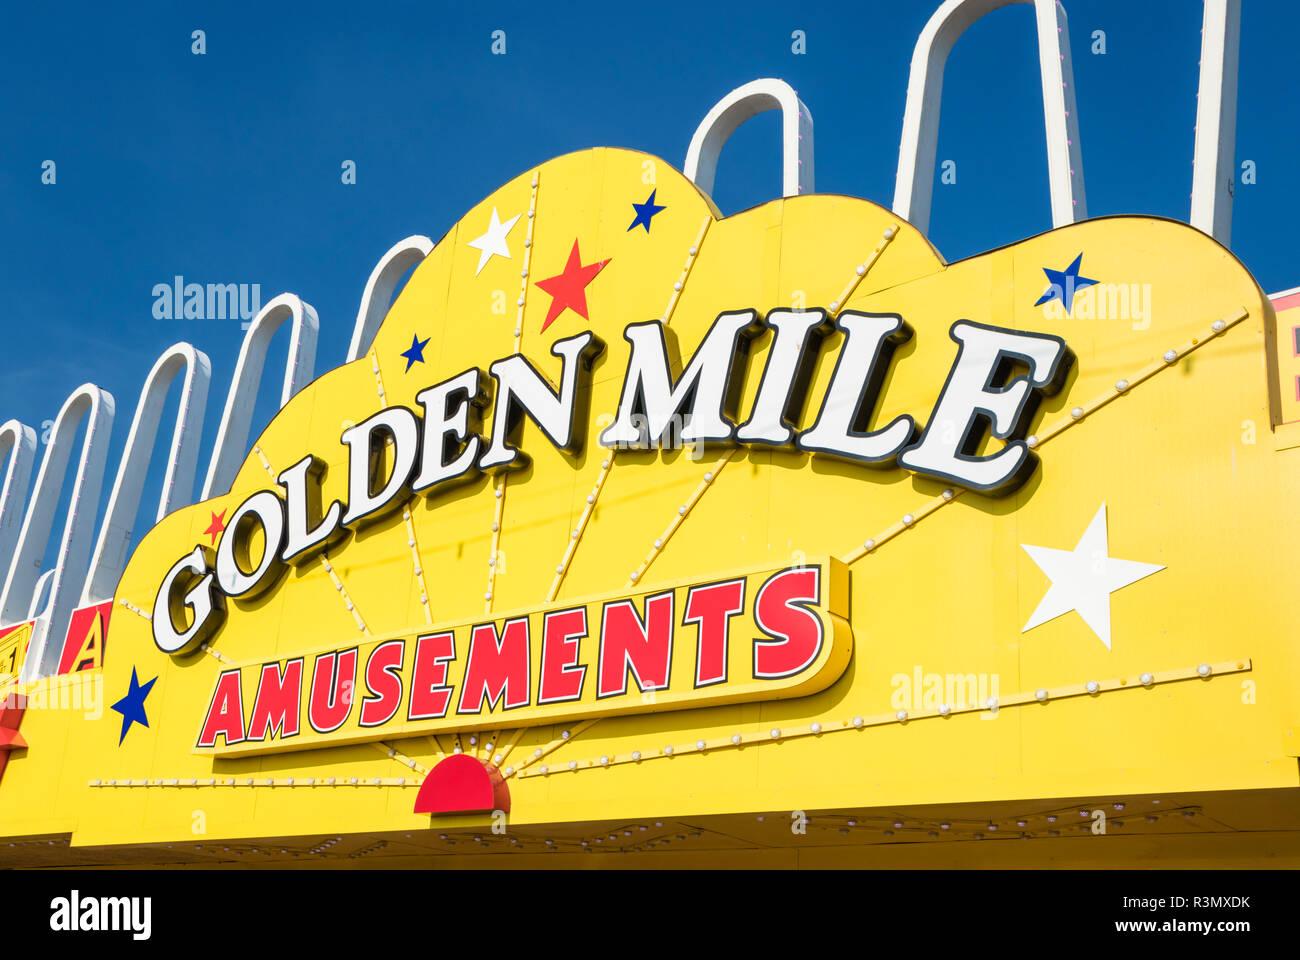 Blackpool Golden Mile amusements amusement arcade on the seafront promenade Blackpool Lancashire England GB UK Europe - Stock Image